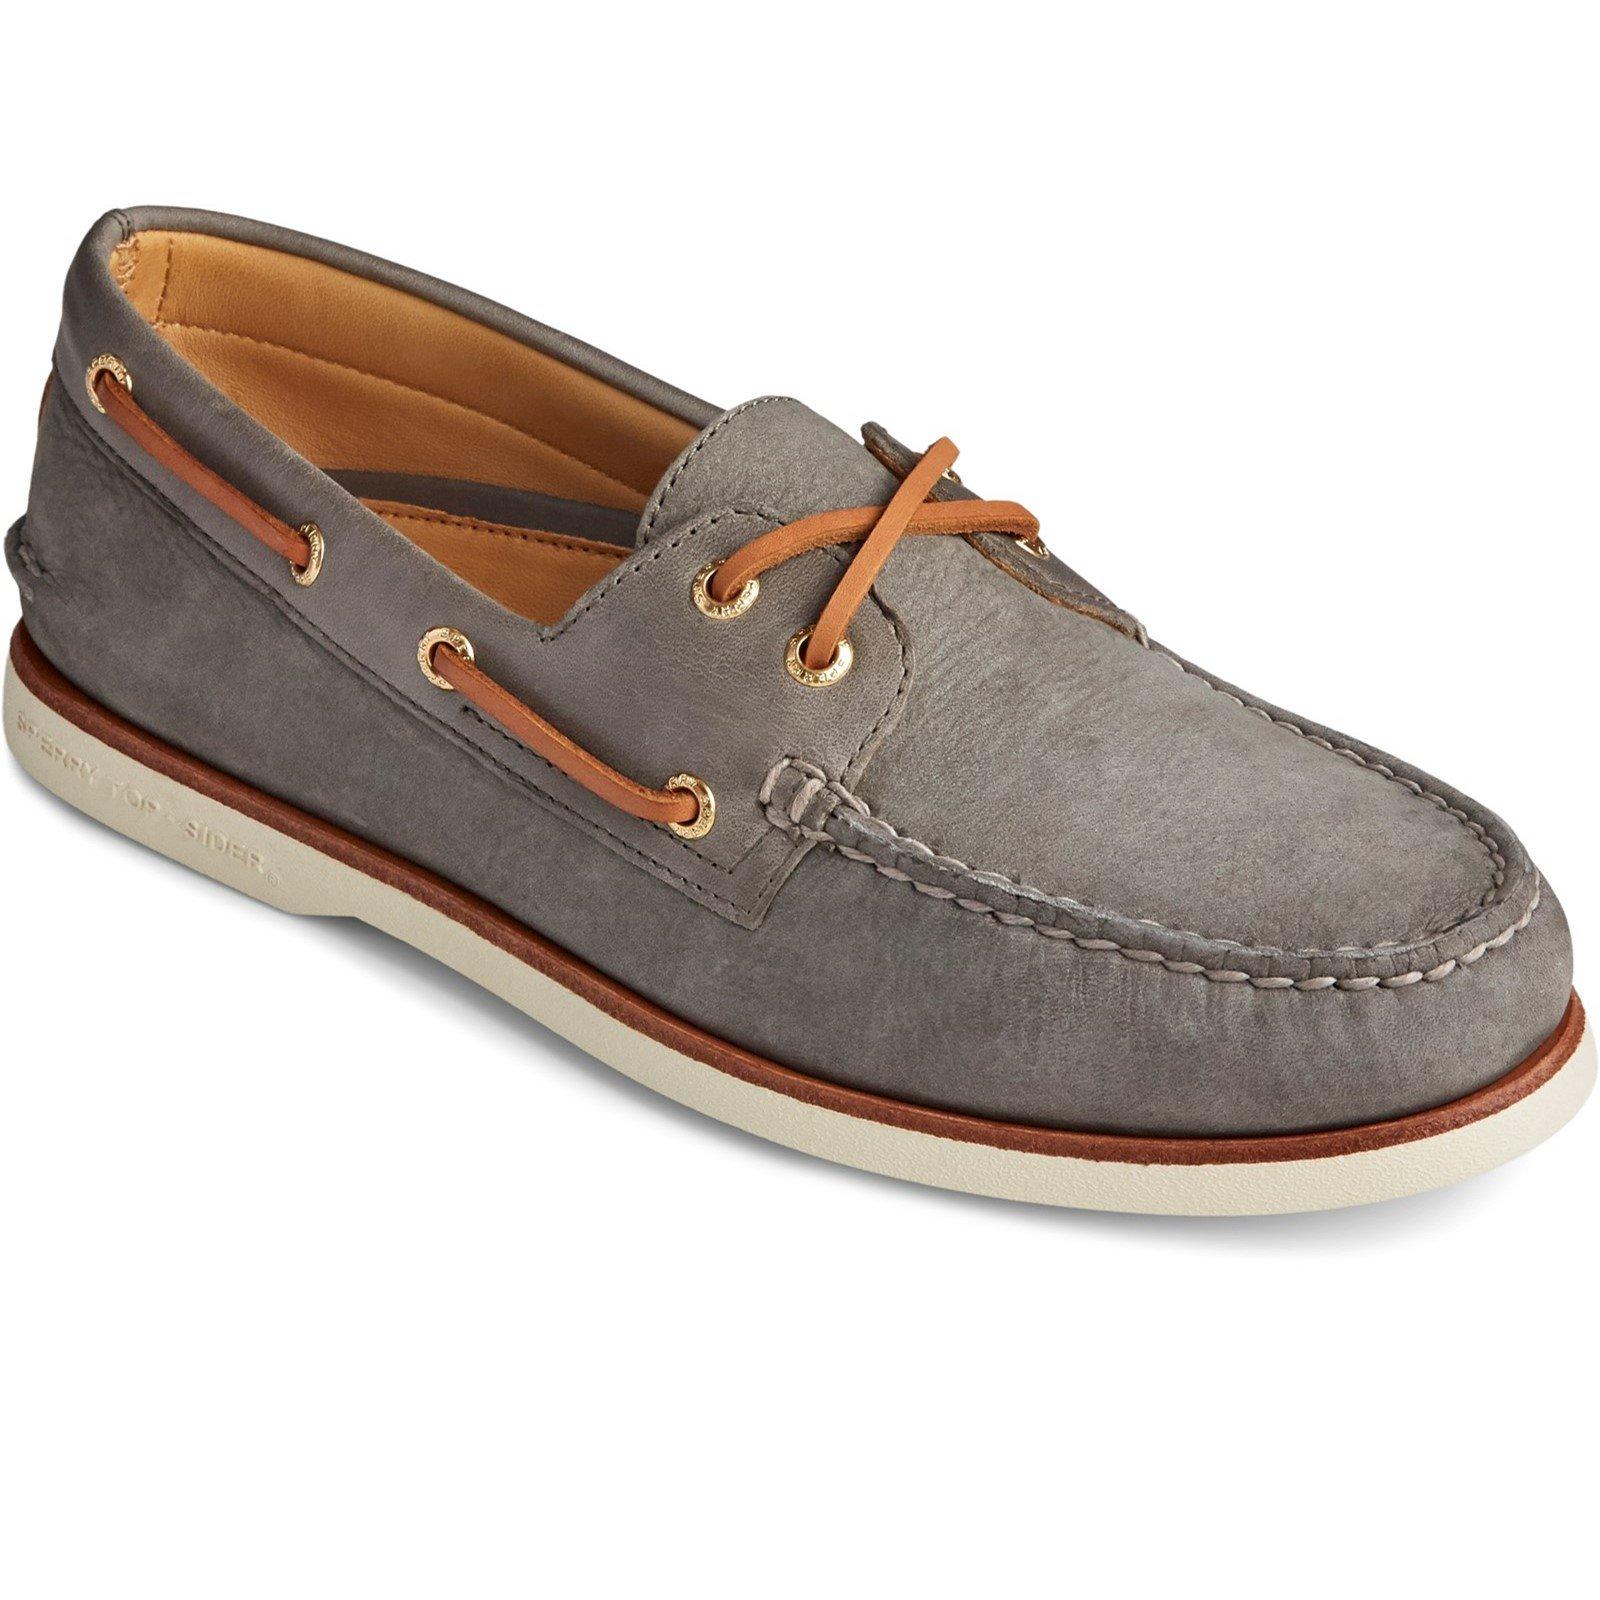 Sperry Men's Authentic Original Seaside Boat Shoe Grey 31529 - Grey 11